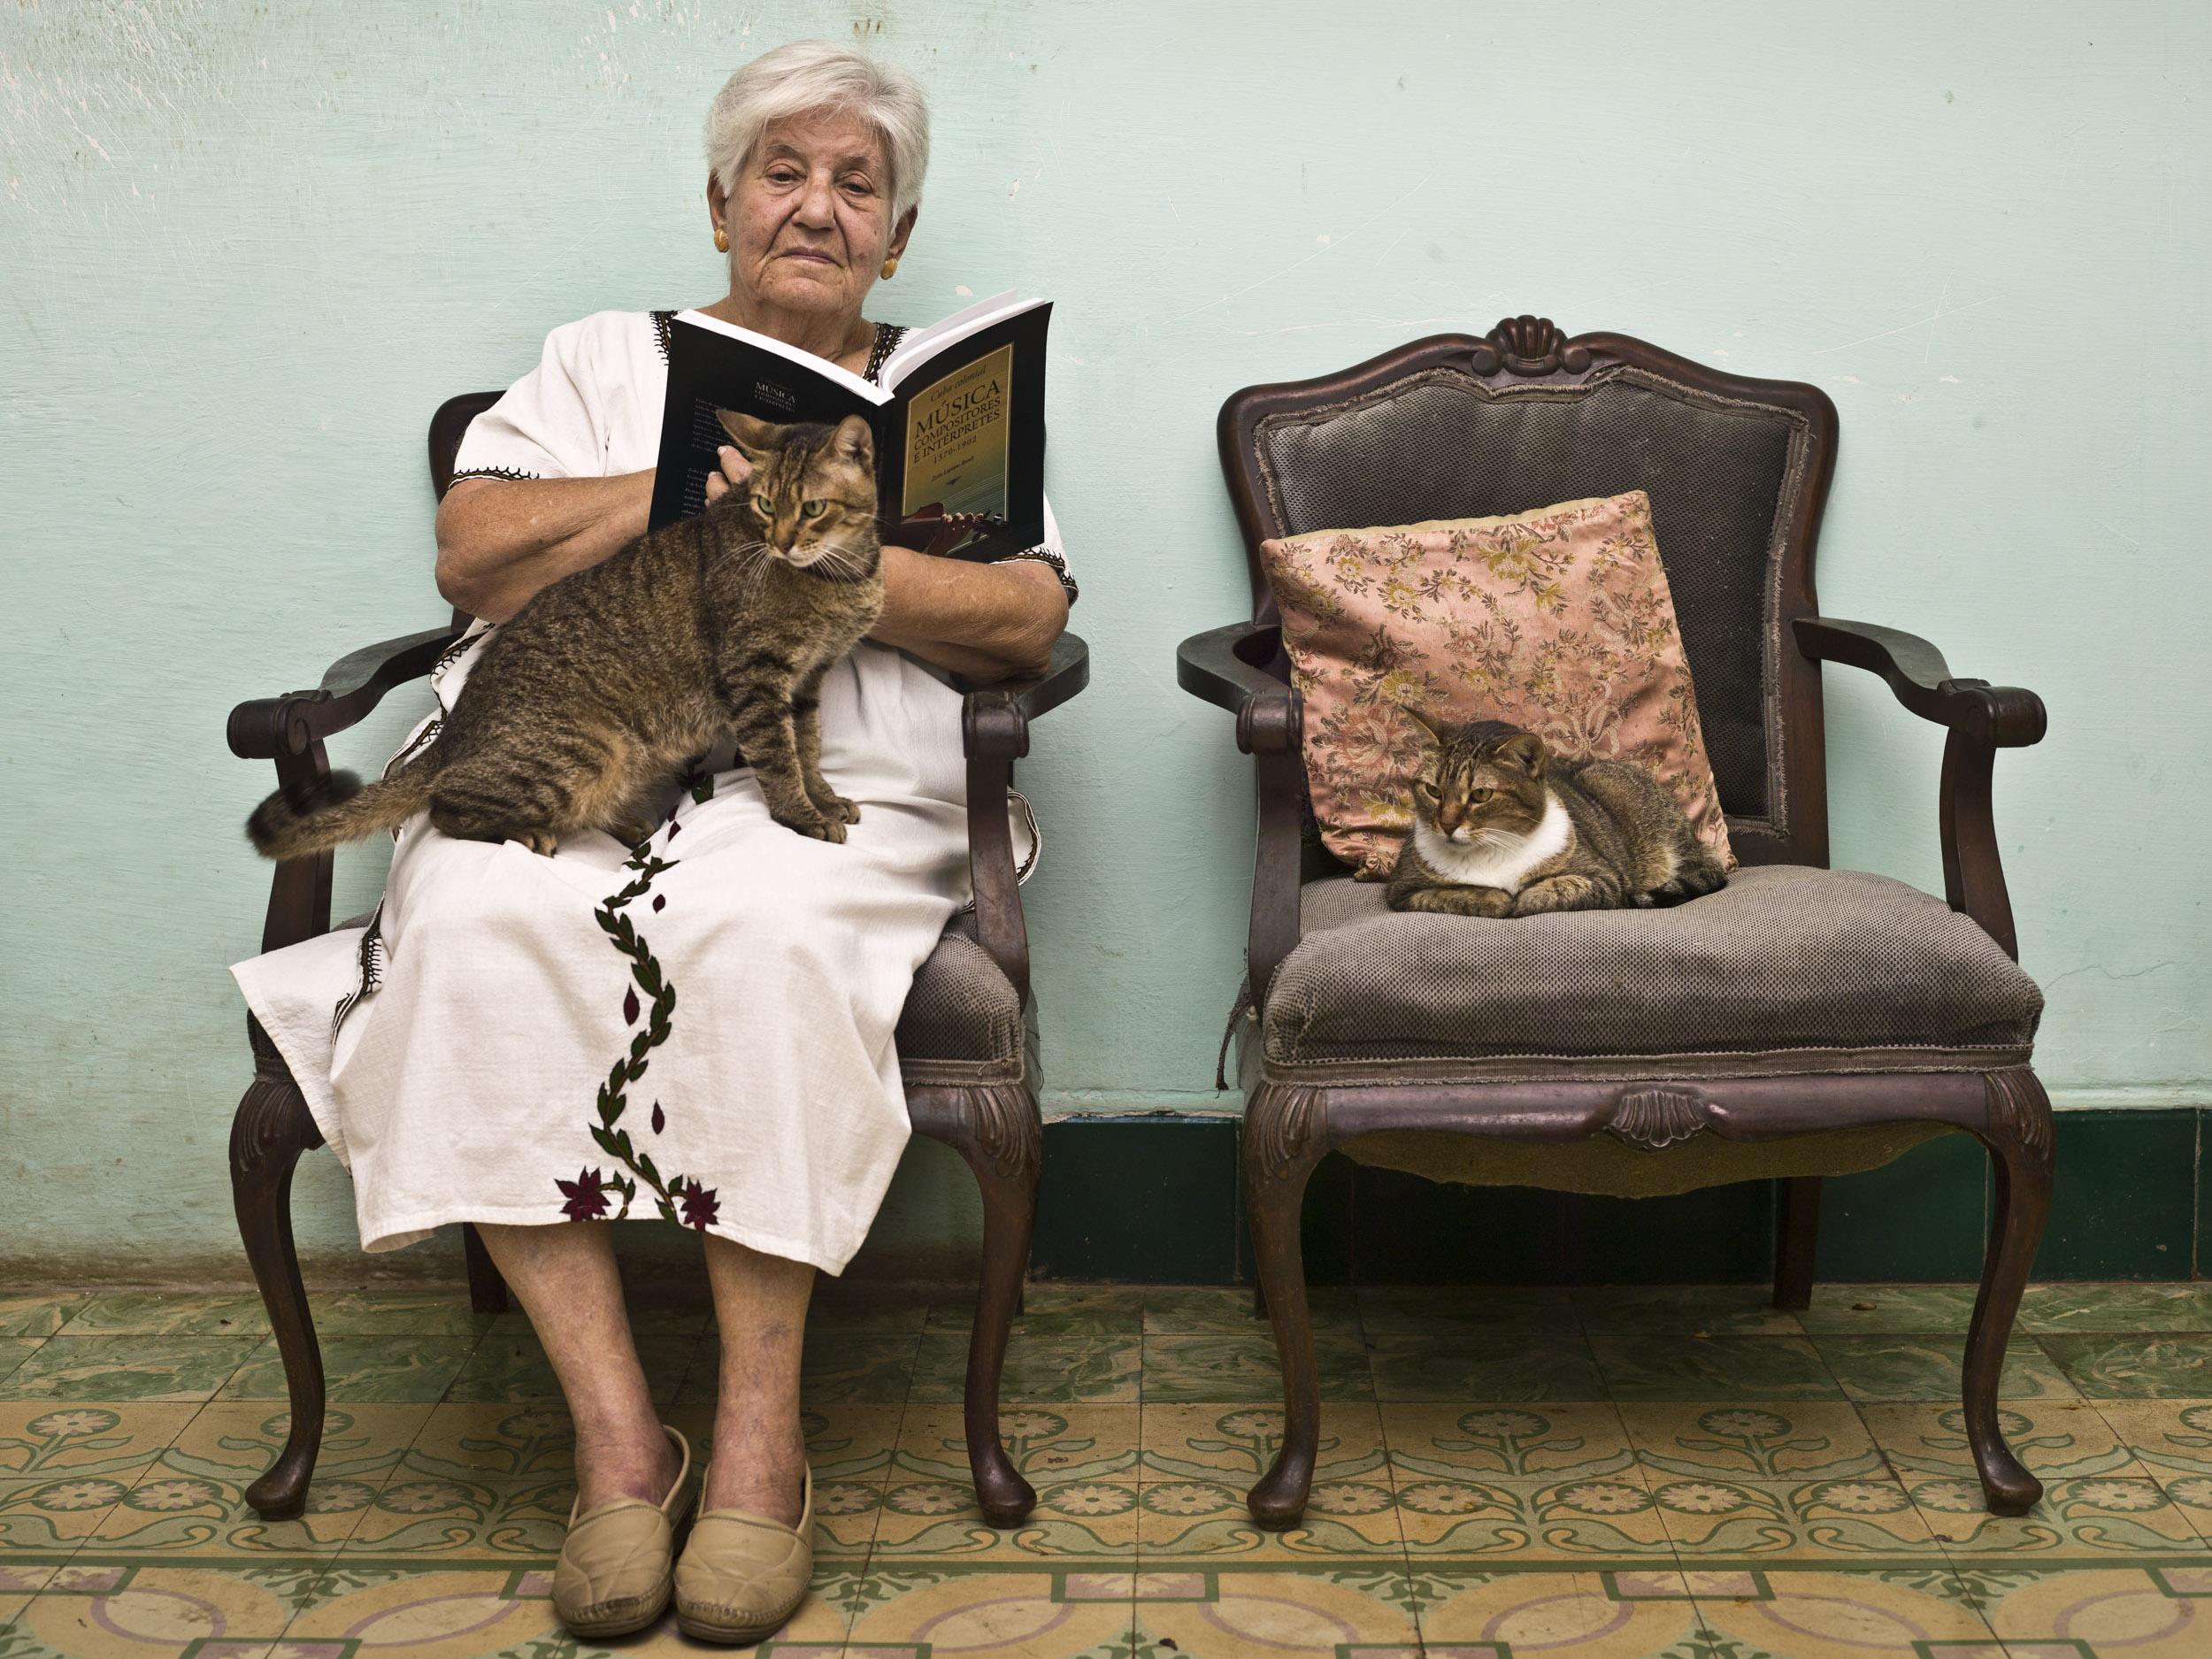 Zoila Lapique, writer - Illuminated Cuba - Hector Garrido, Aerial and human photography